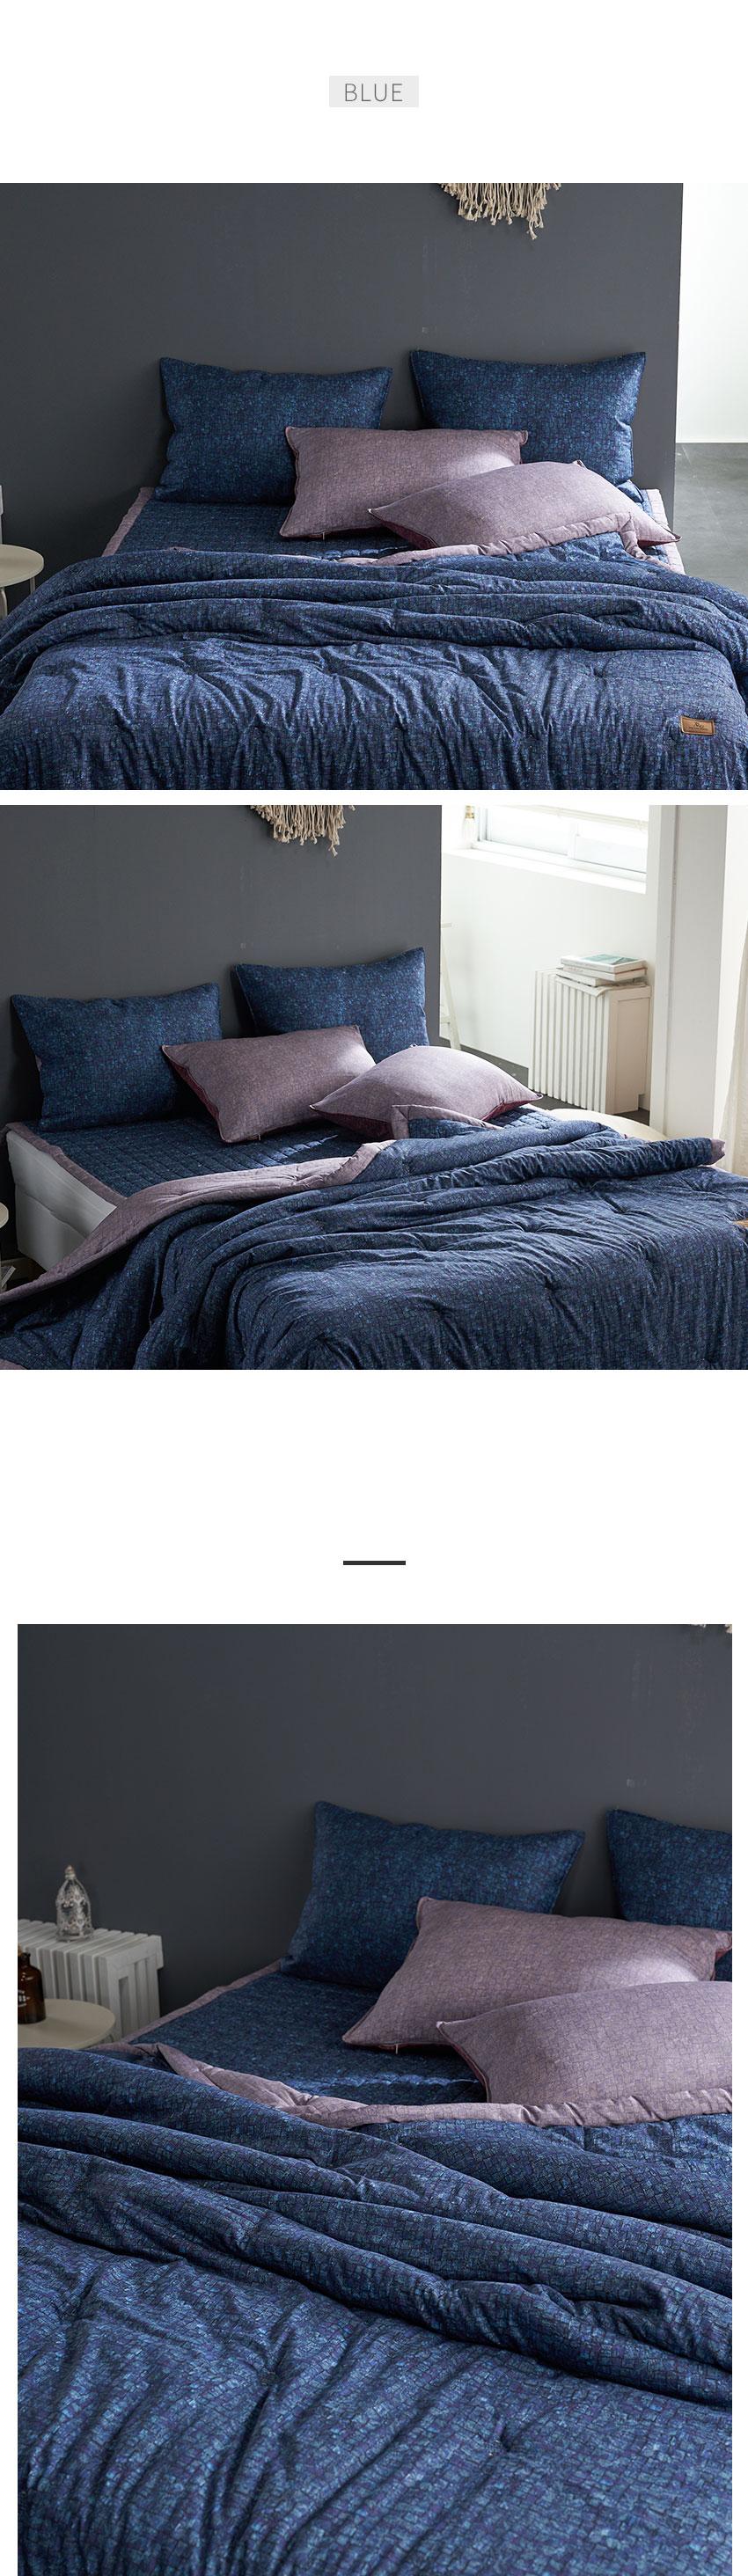 classic_bed_blue_01.jpg